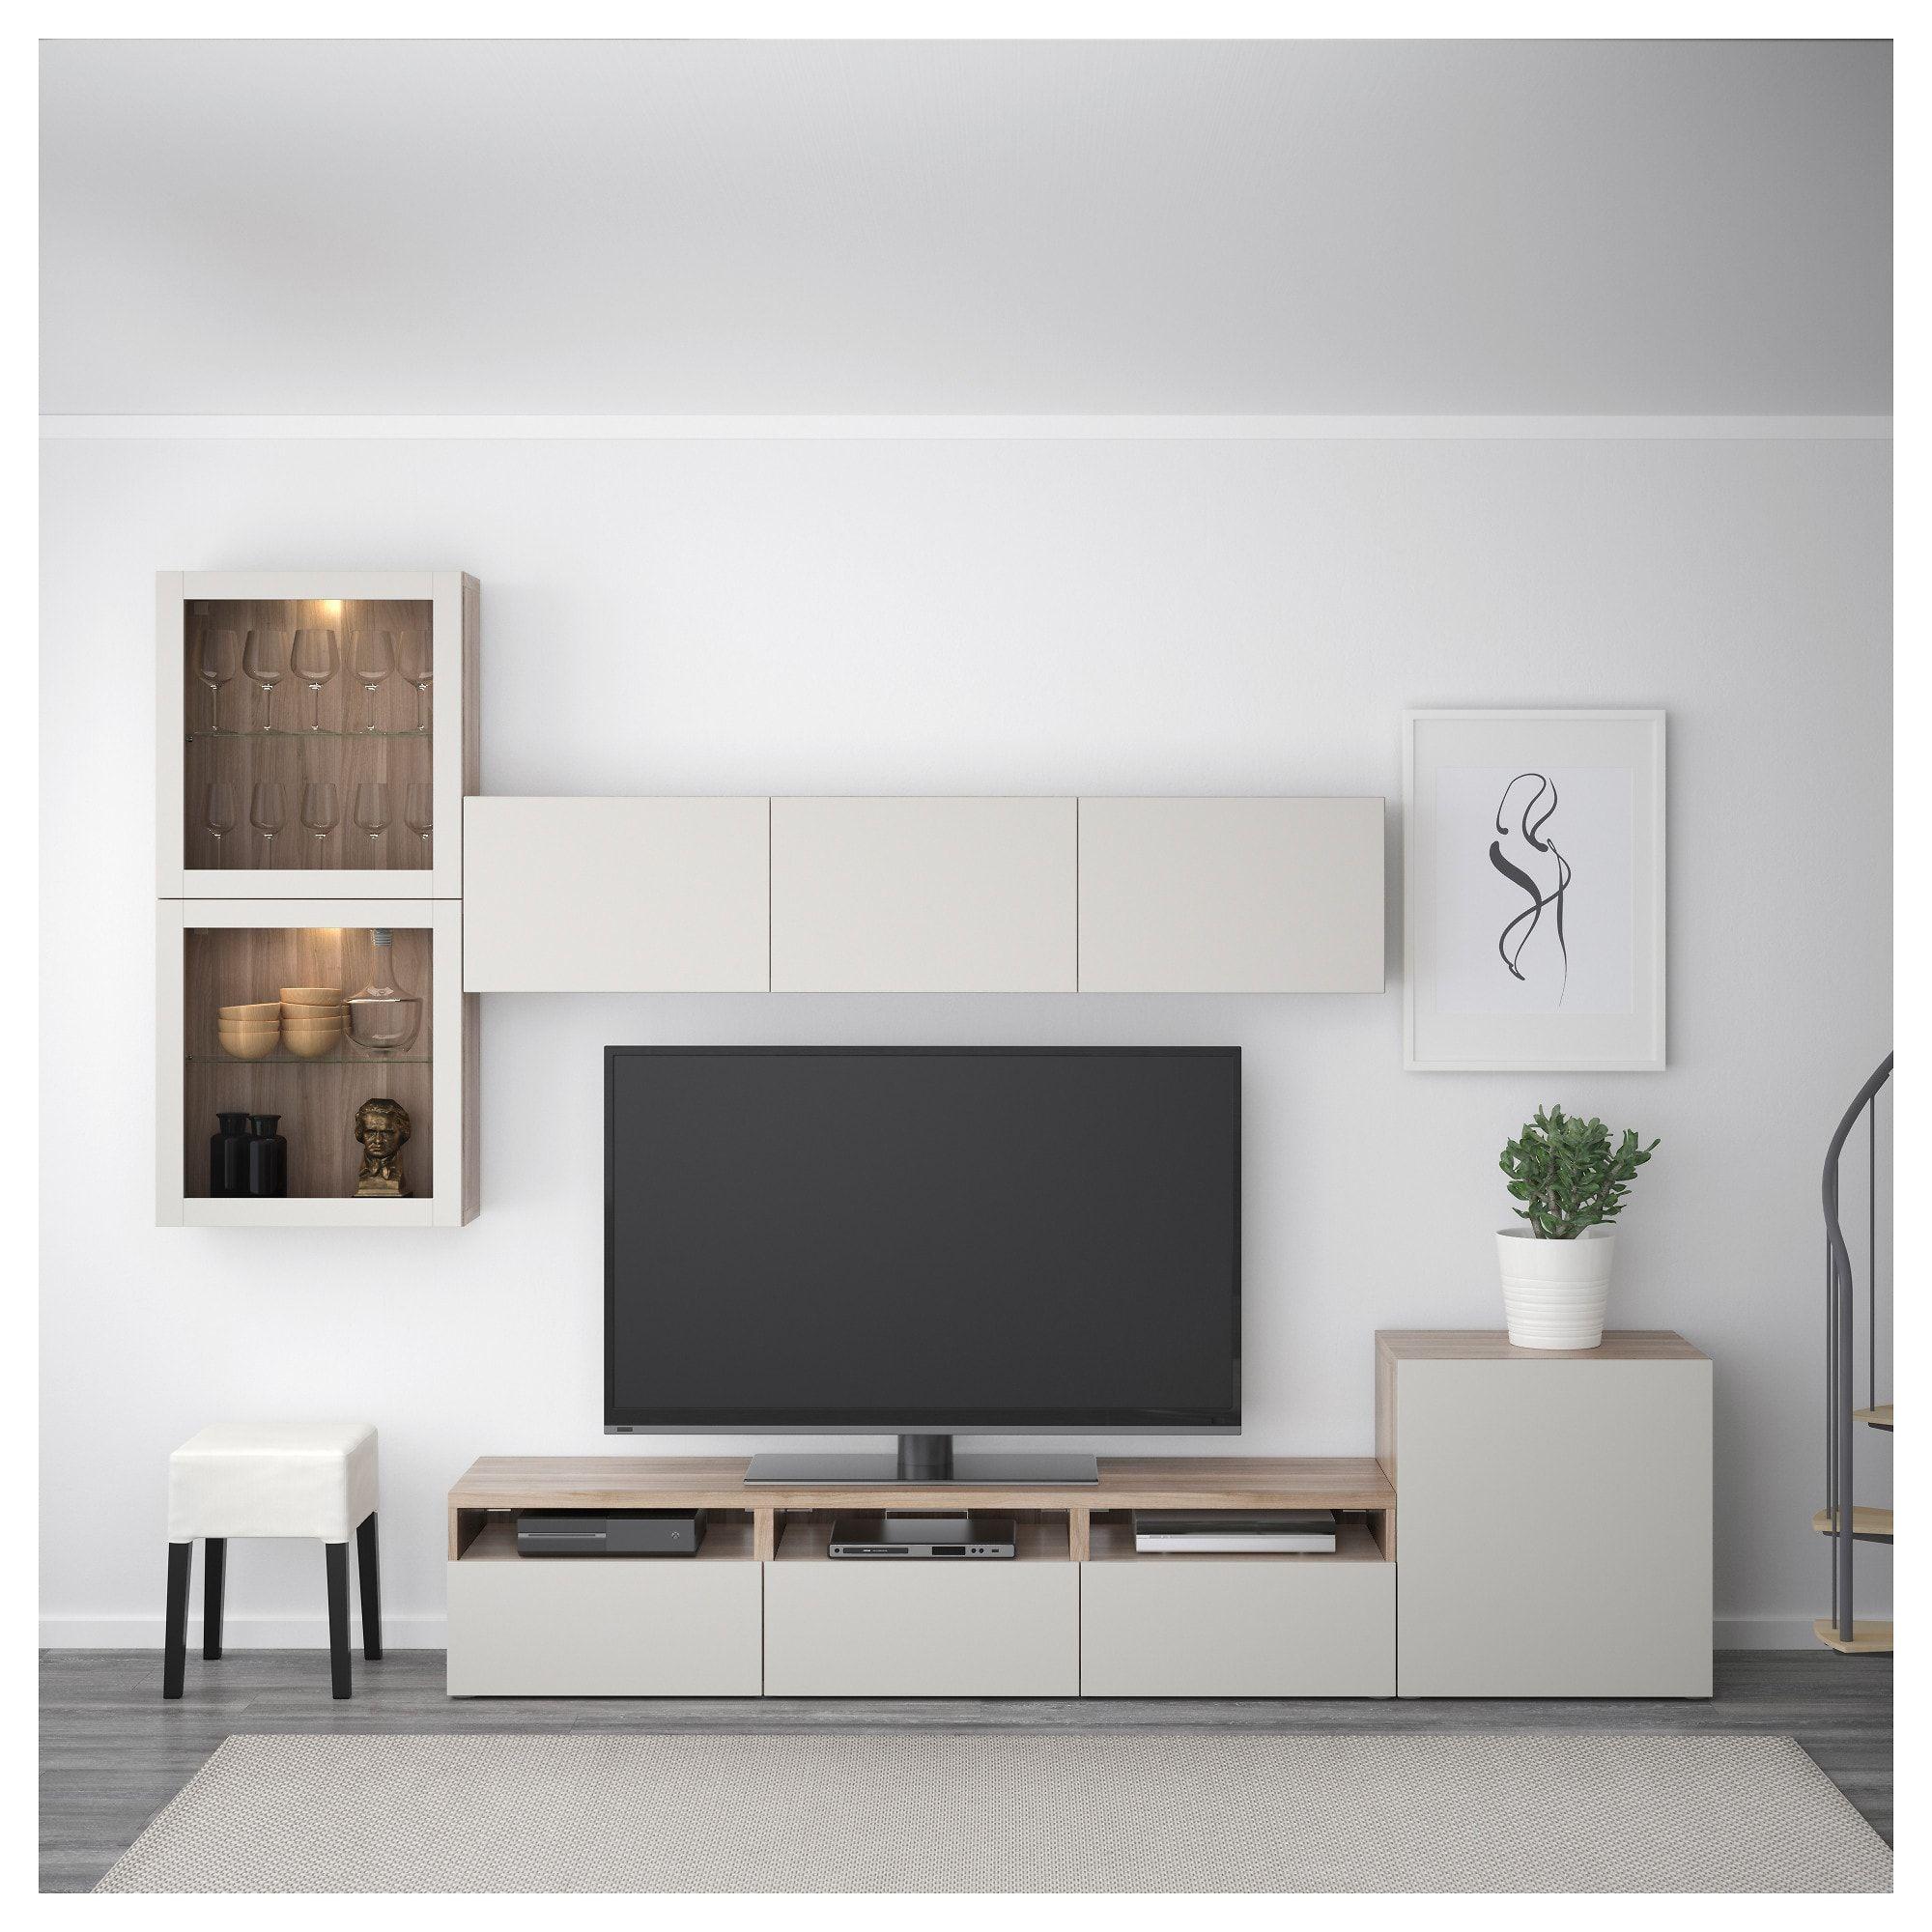 BESTÅ TV storage combination/glass doors, Height: 83 1/8 Max. screen size: 70. Get it here! - IKEA